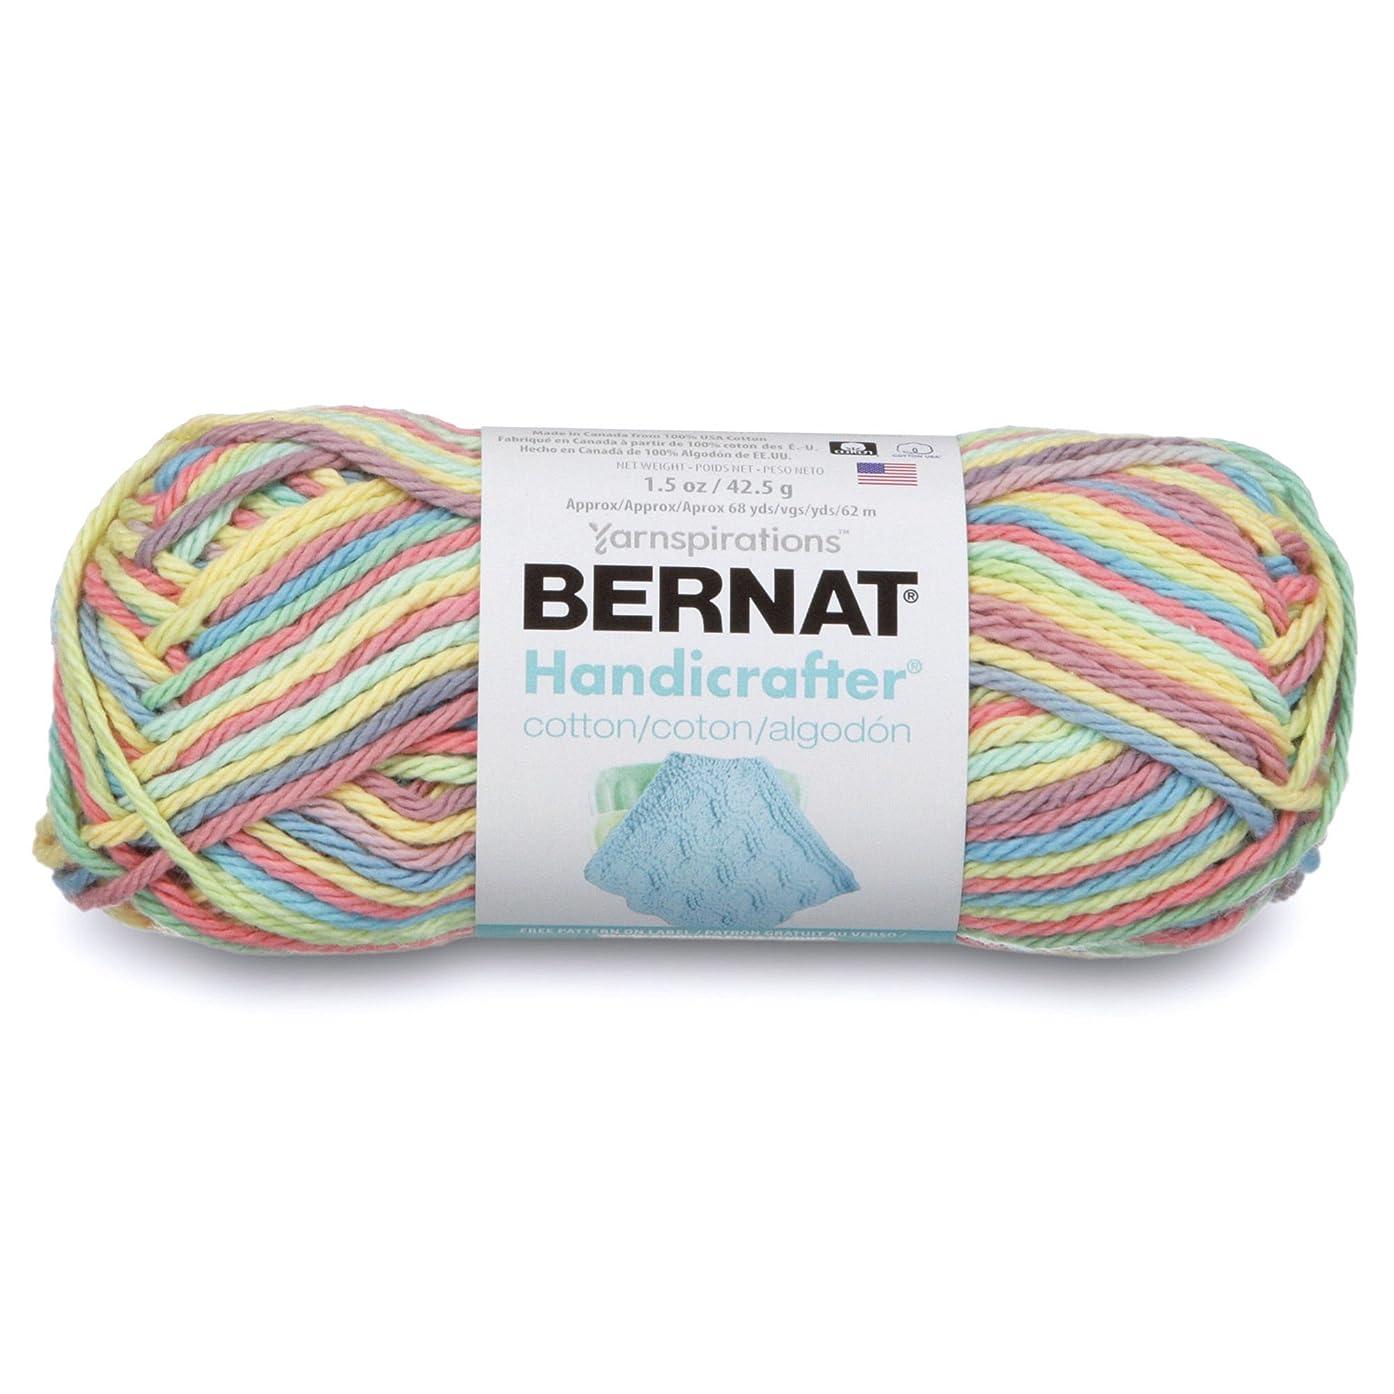 Bernat Handicrafter Cotton Ombre Yarn, 1.5 oz, Gauge 4 Medium, 100% Cotton, Candy Spinkle Ombre